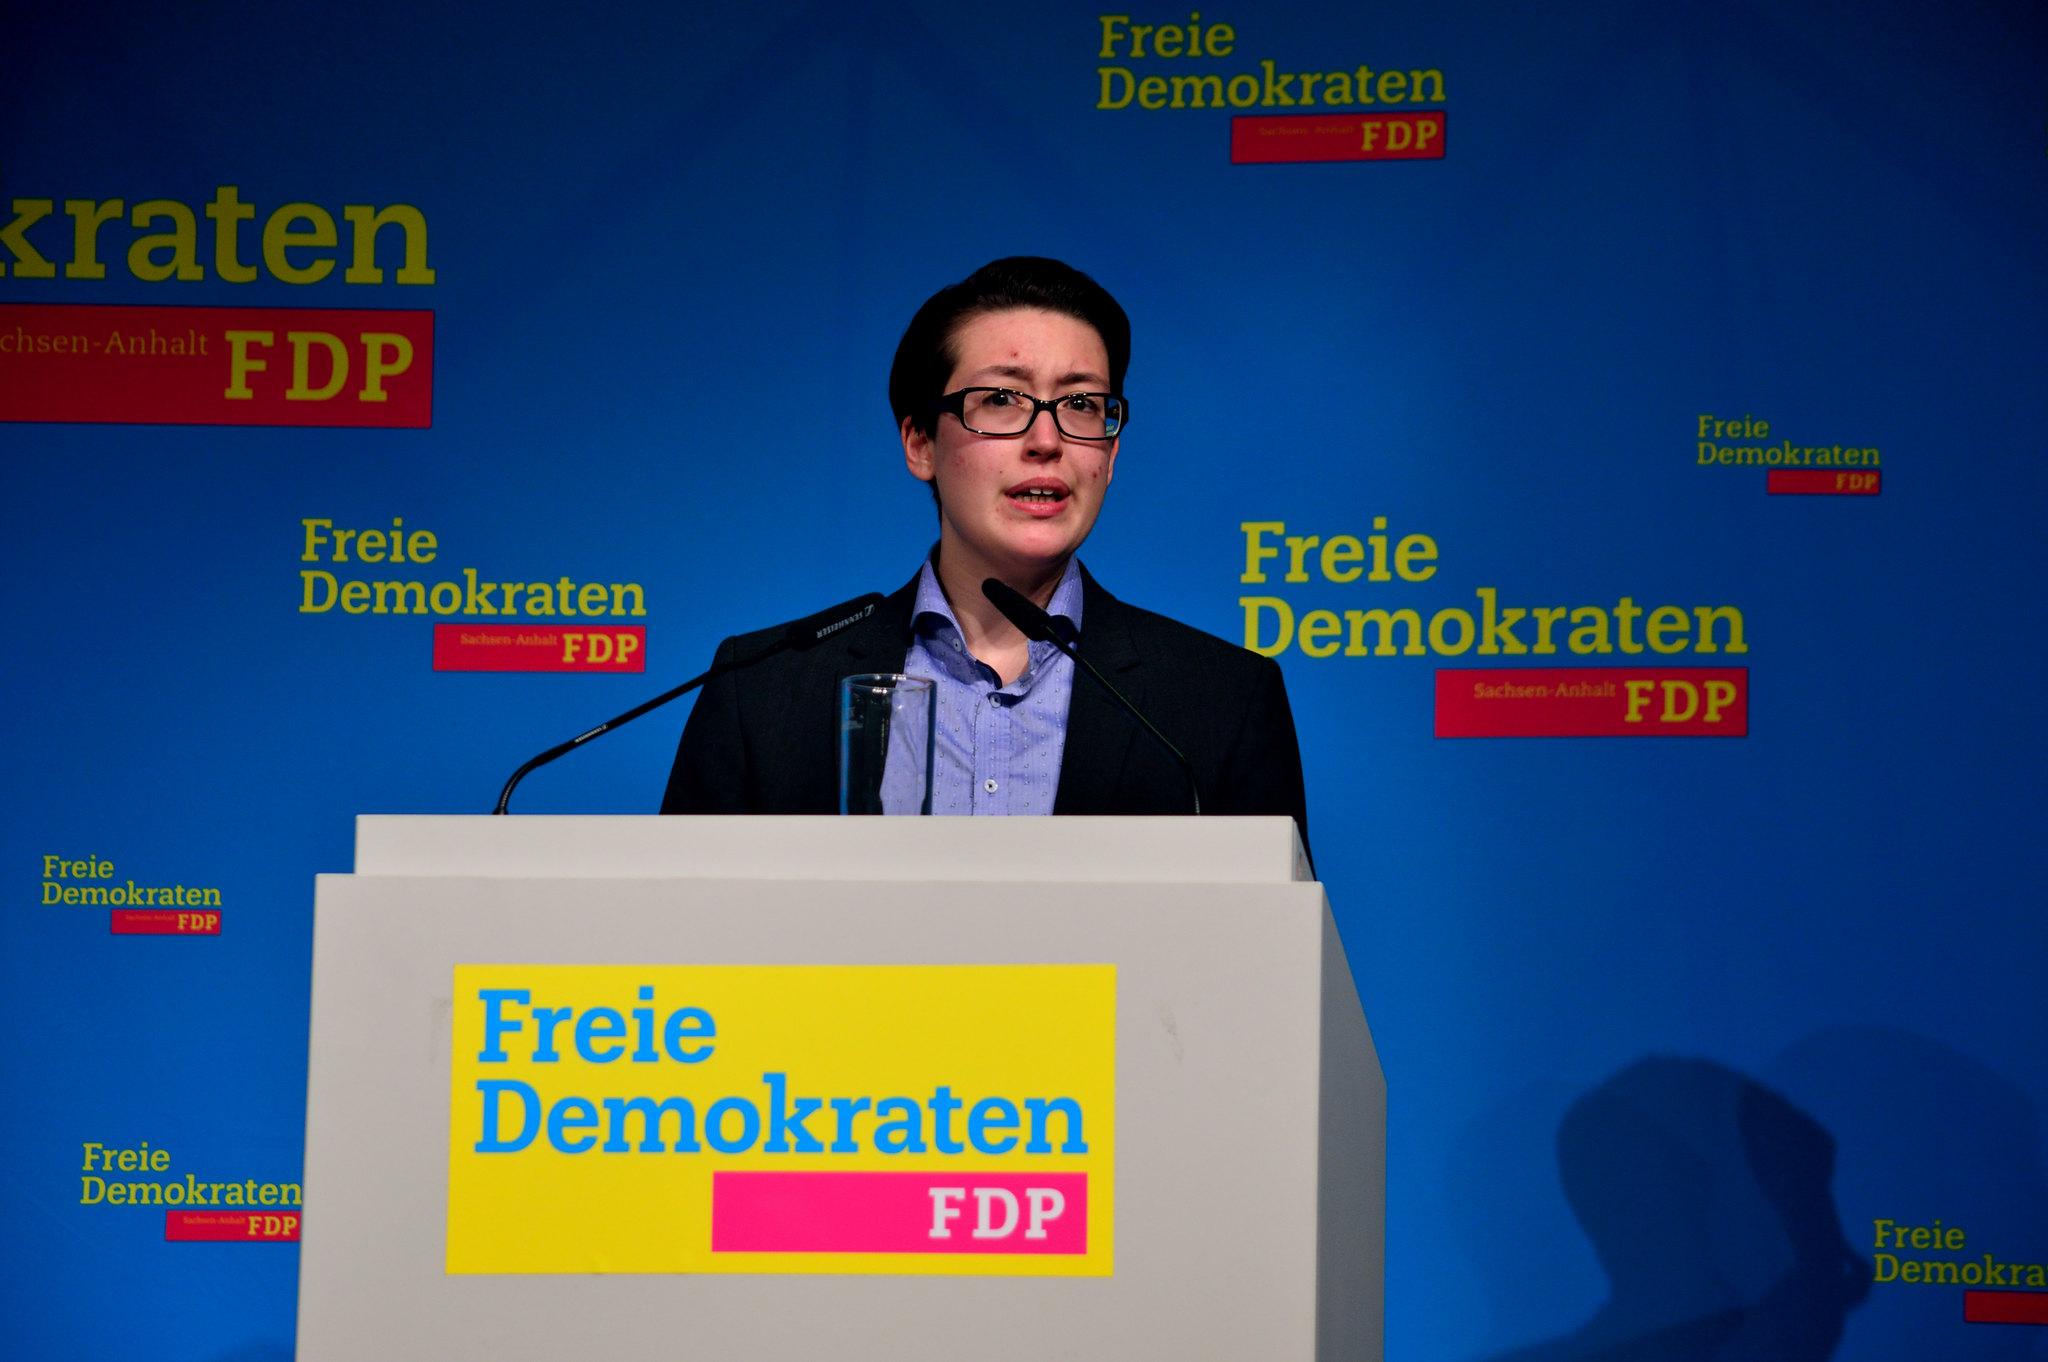 FDP LVV 2017